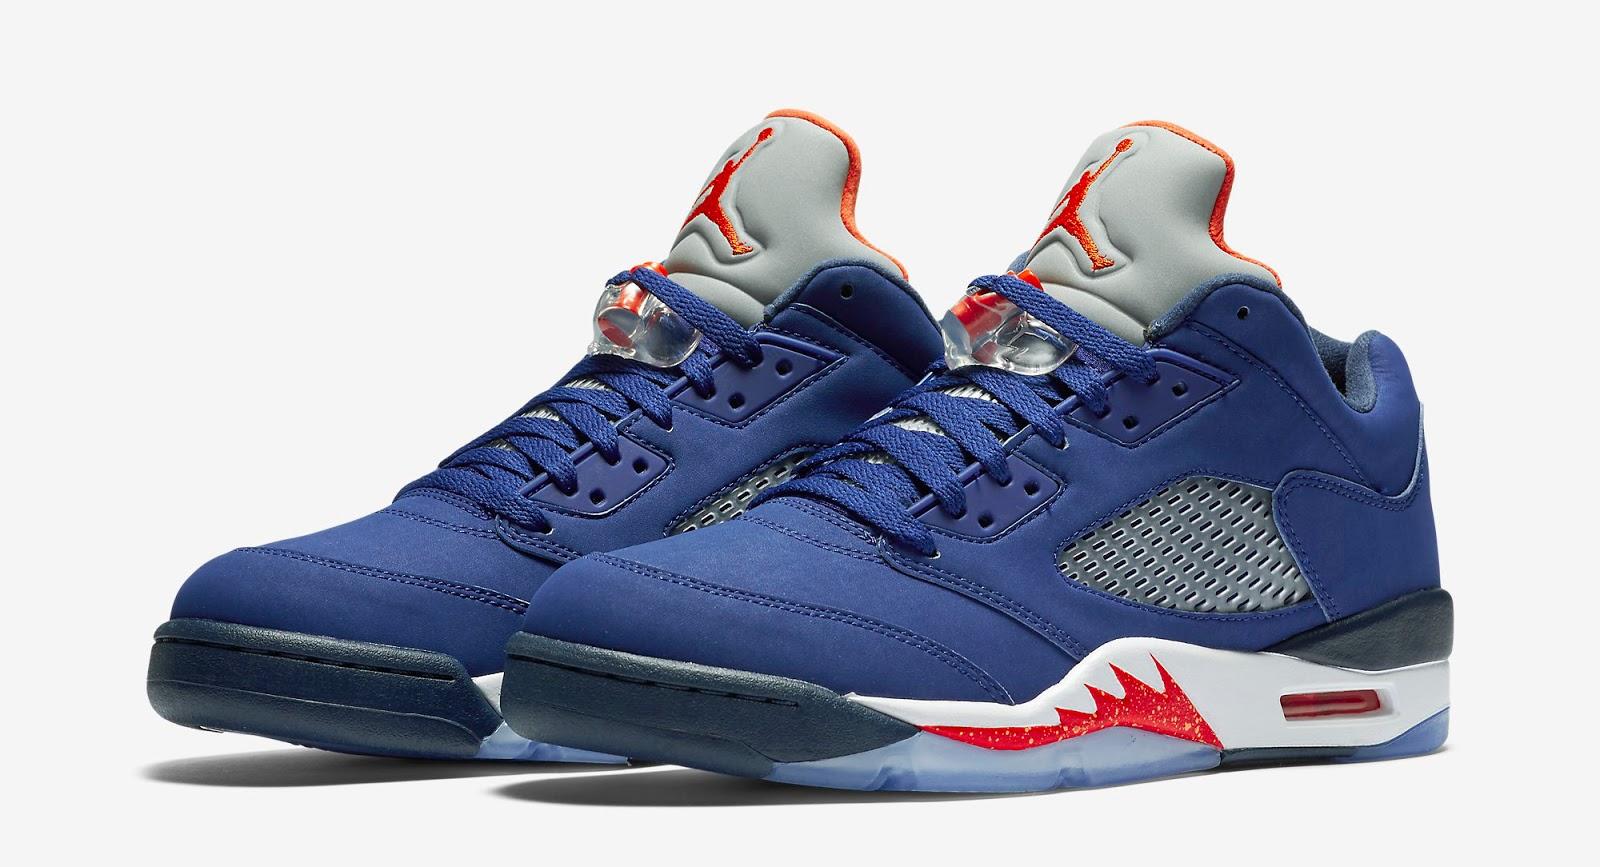 New Jordan 5 Retro Orange Red Blue Shoes